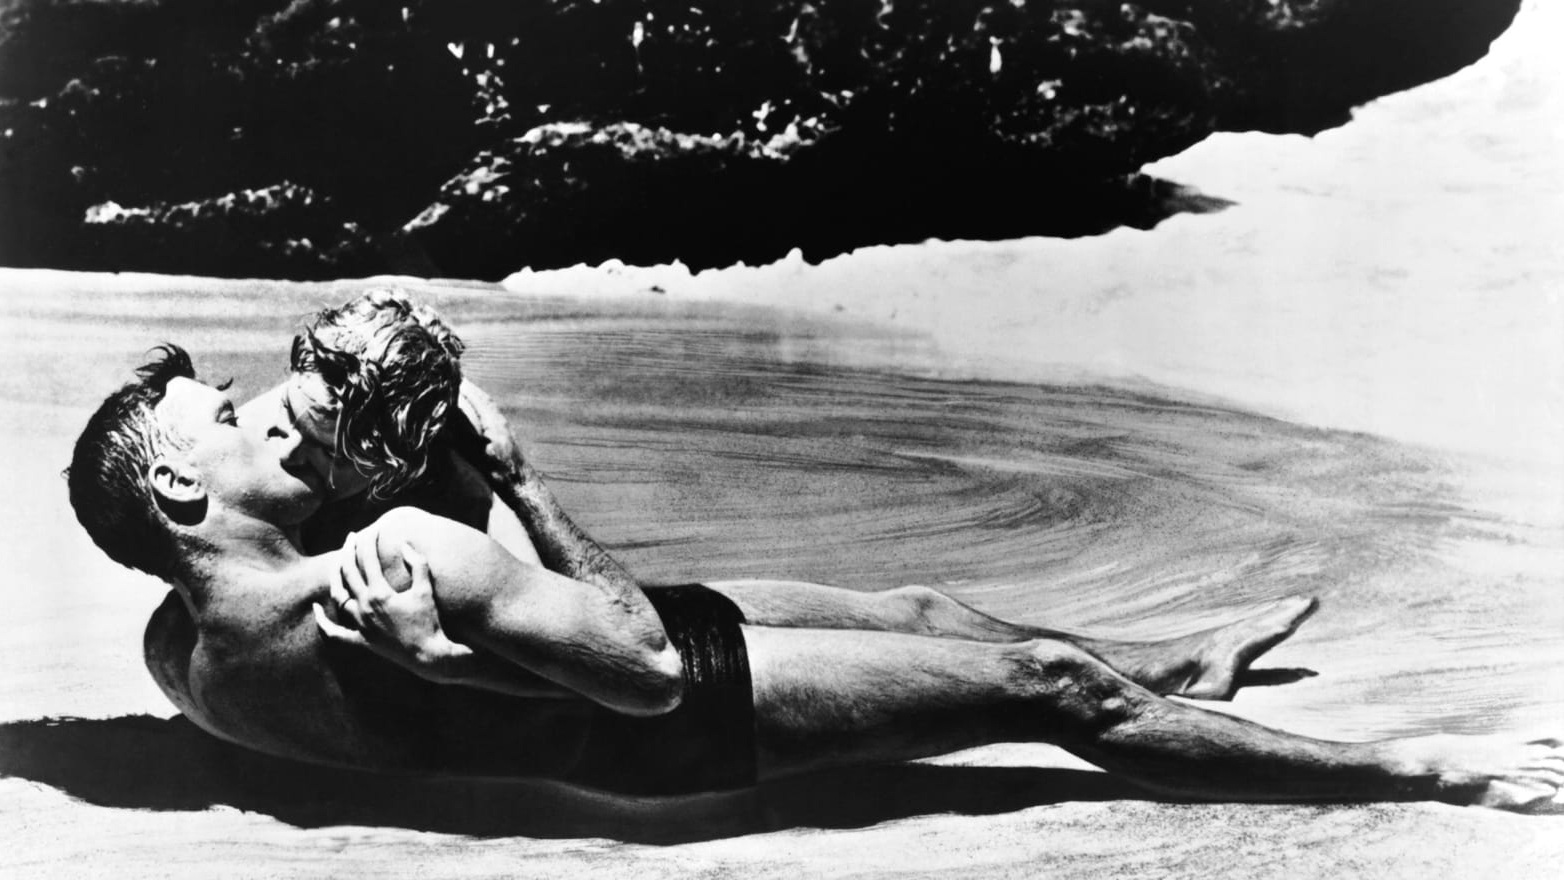 #4) From Here to Eternity - (1957 - dir. Fred Zinneman)